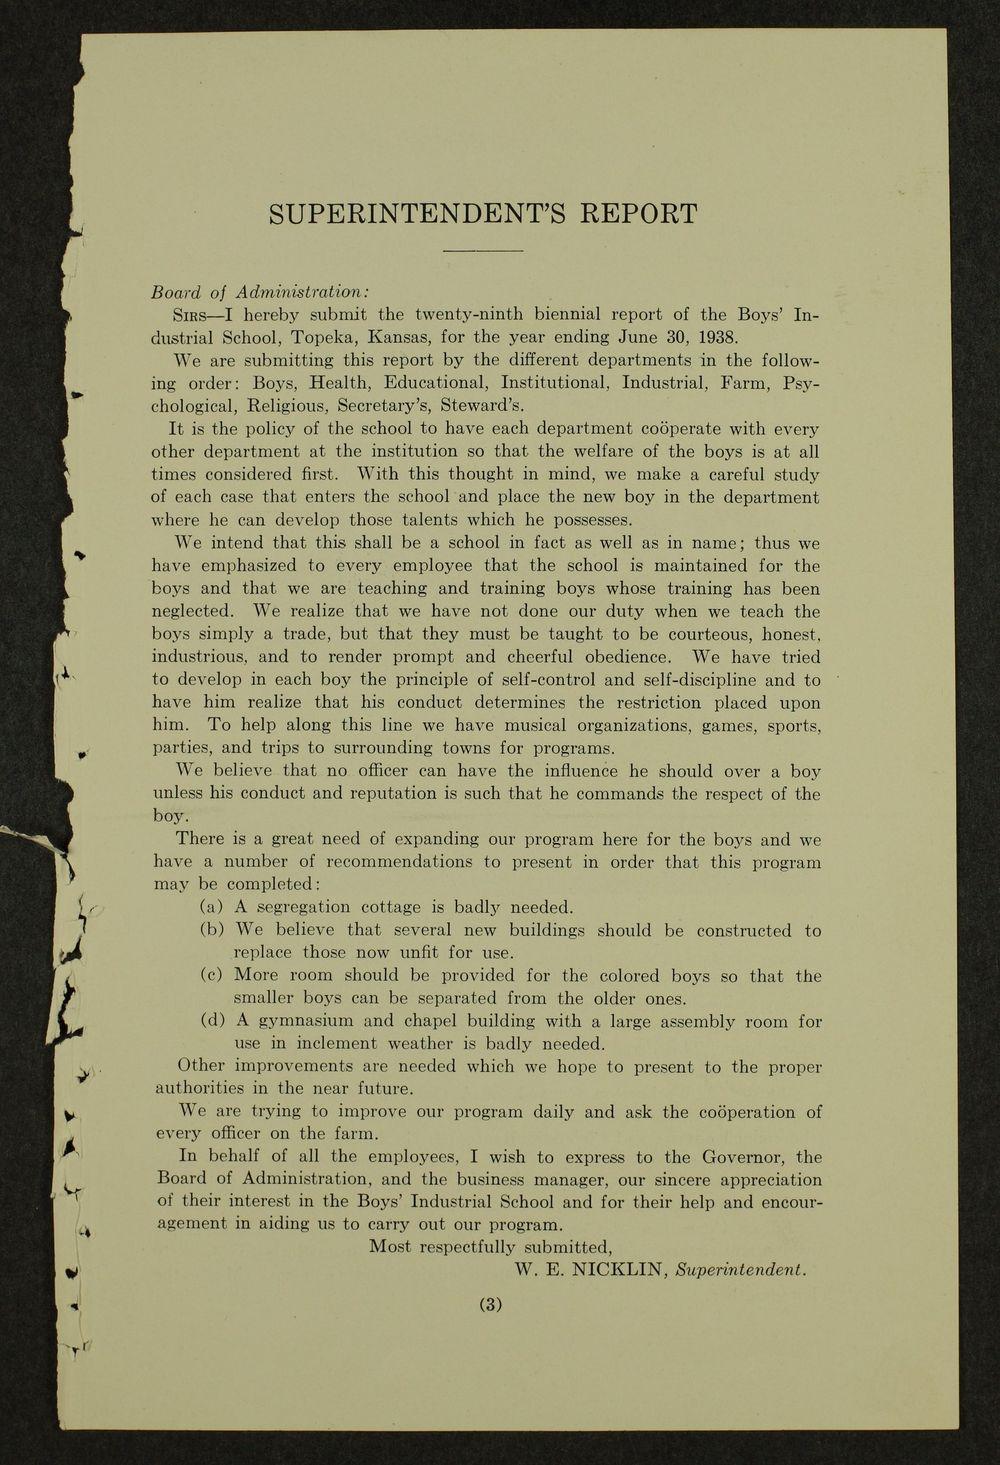 Biennial report of the Boys Industrial School, 1938 - 3